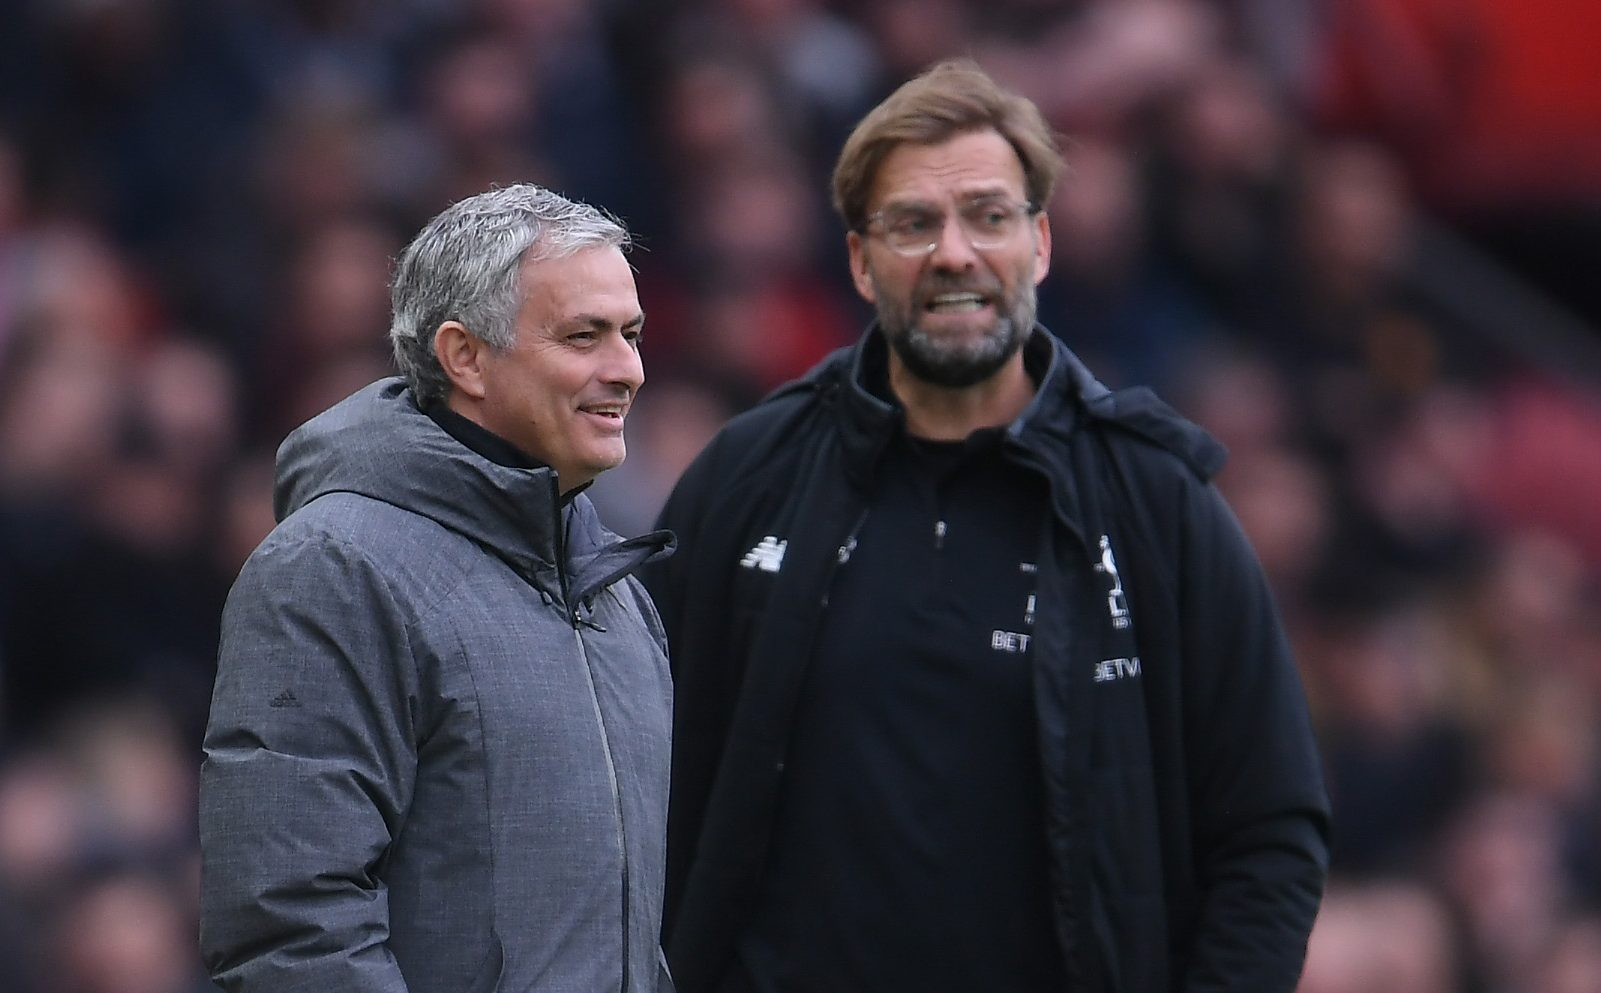 Jose Mourinho gave brutal reason why Jurgen Klopp is not a 'great' Premier League manager